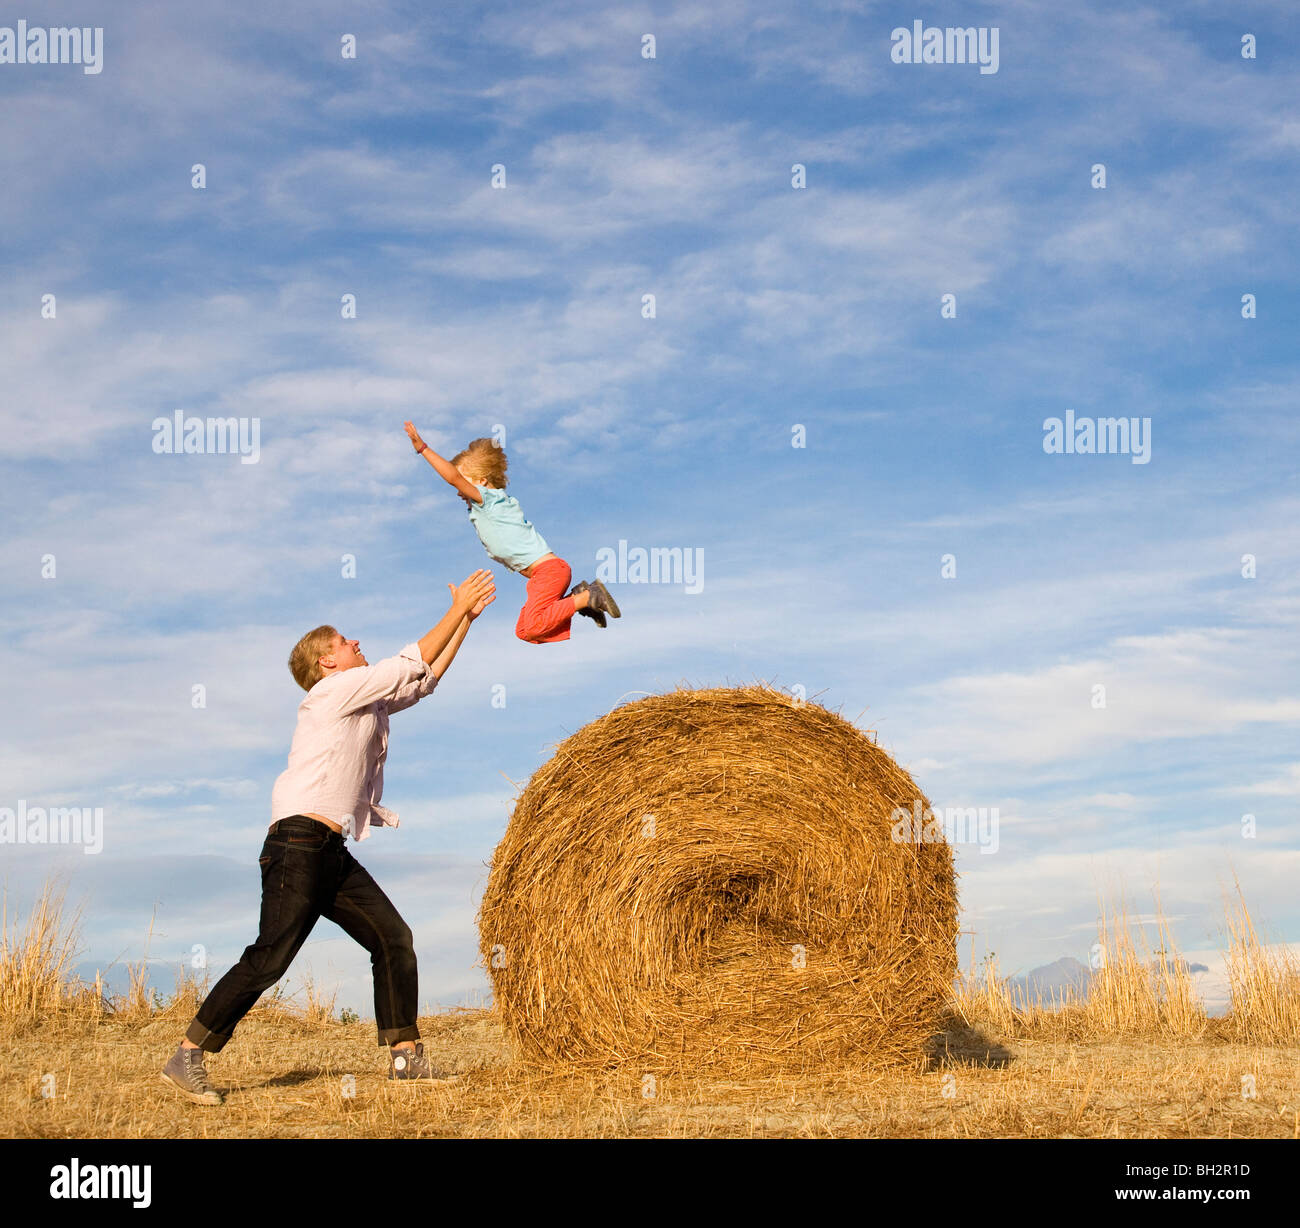 Mann fangen jungen springen von Heuballen Stockbild